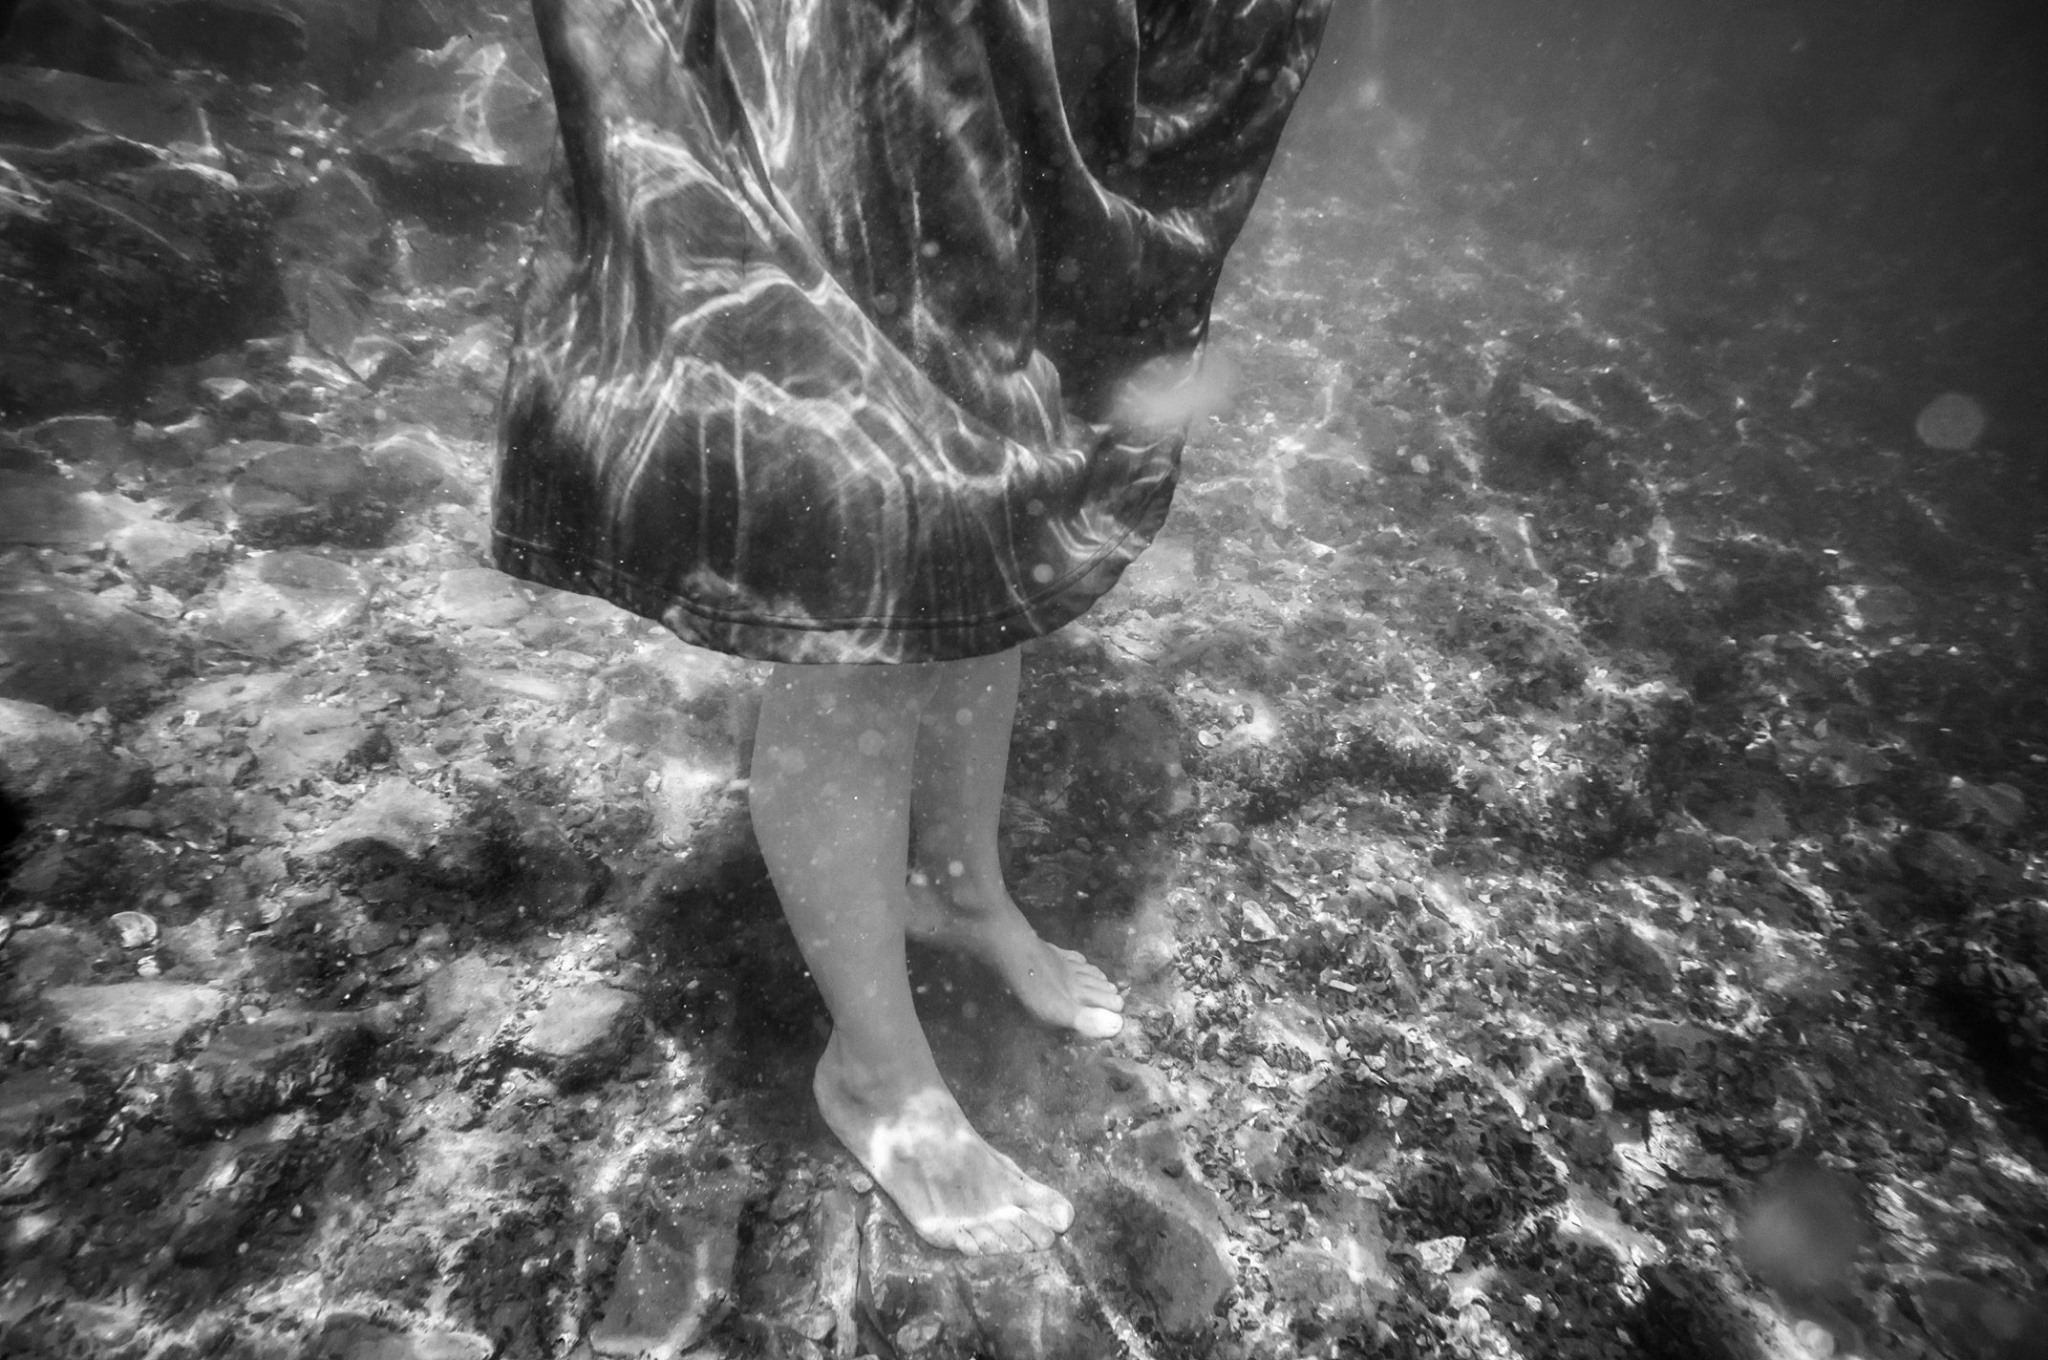 Photo by Carolina Kotchetkoff